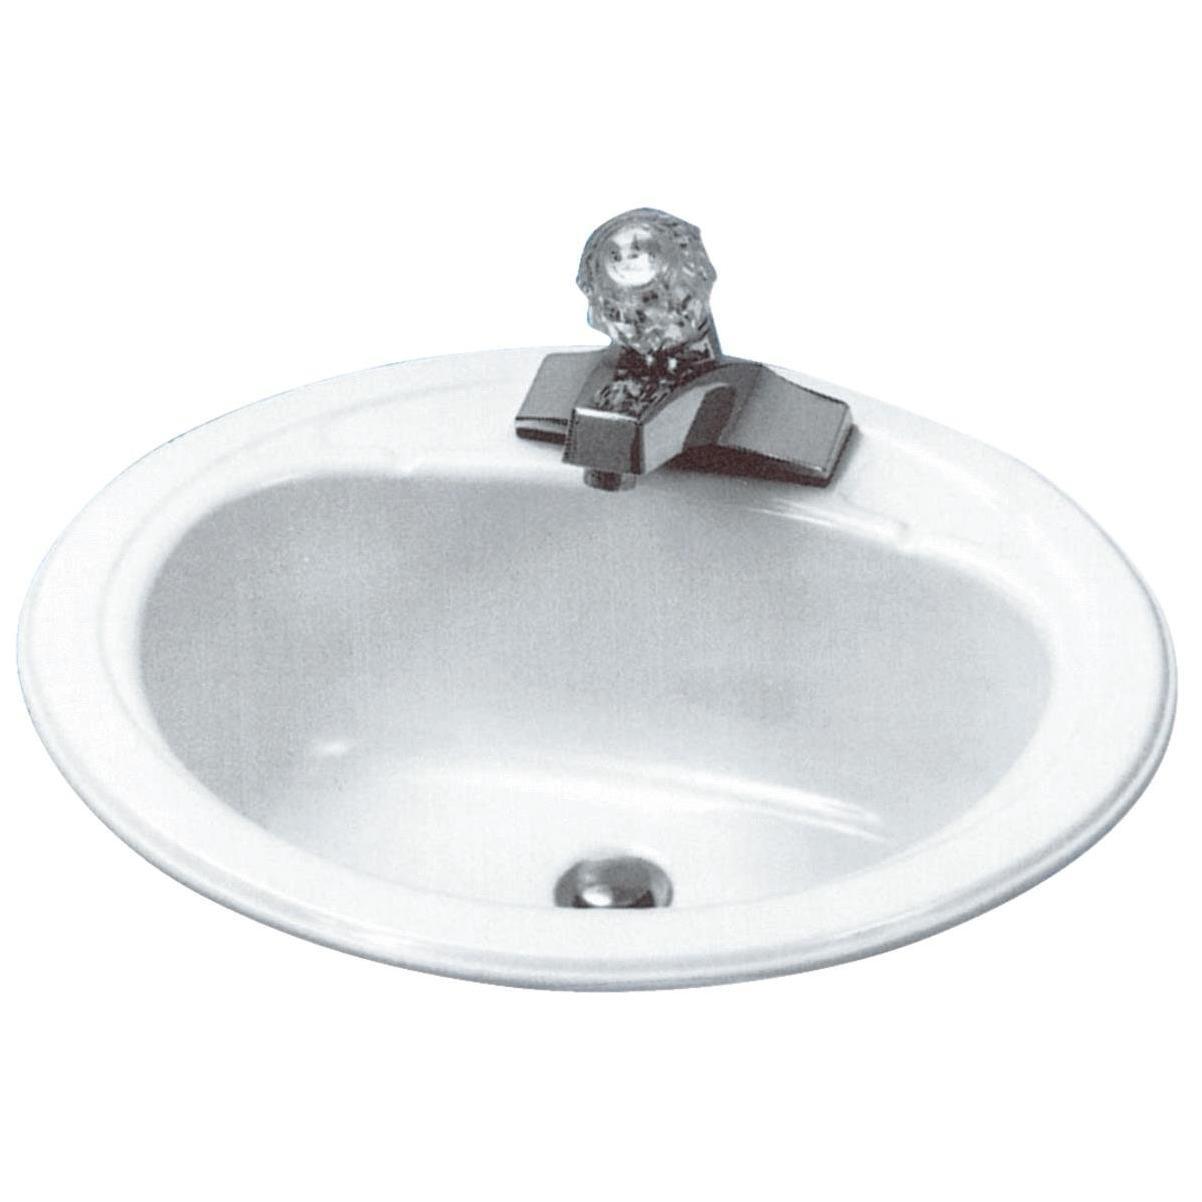 Briggs Anderson Oval Drop In Bathroom Sink White Hills Flat Lumber